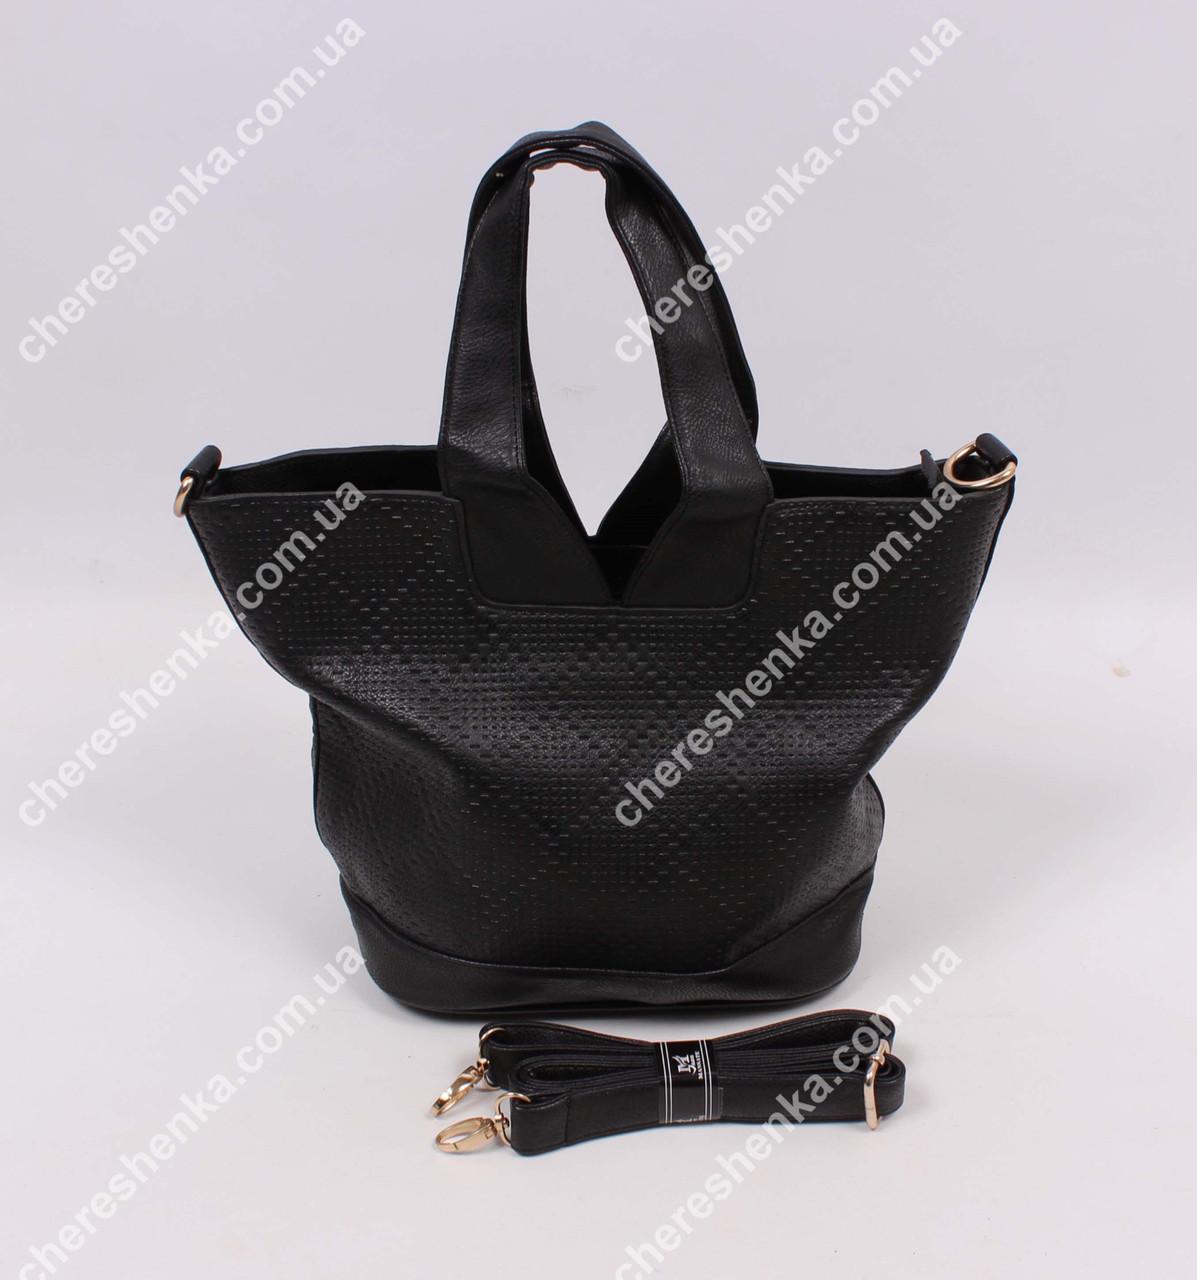 Женская сумочка Yameiou MB-941